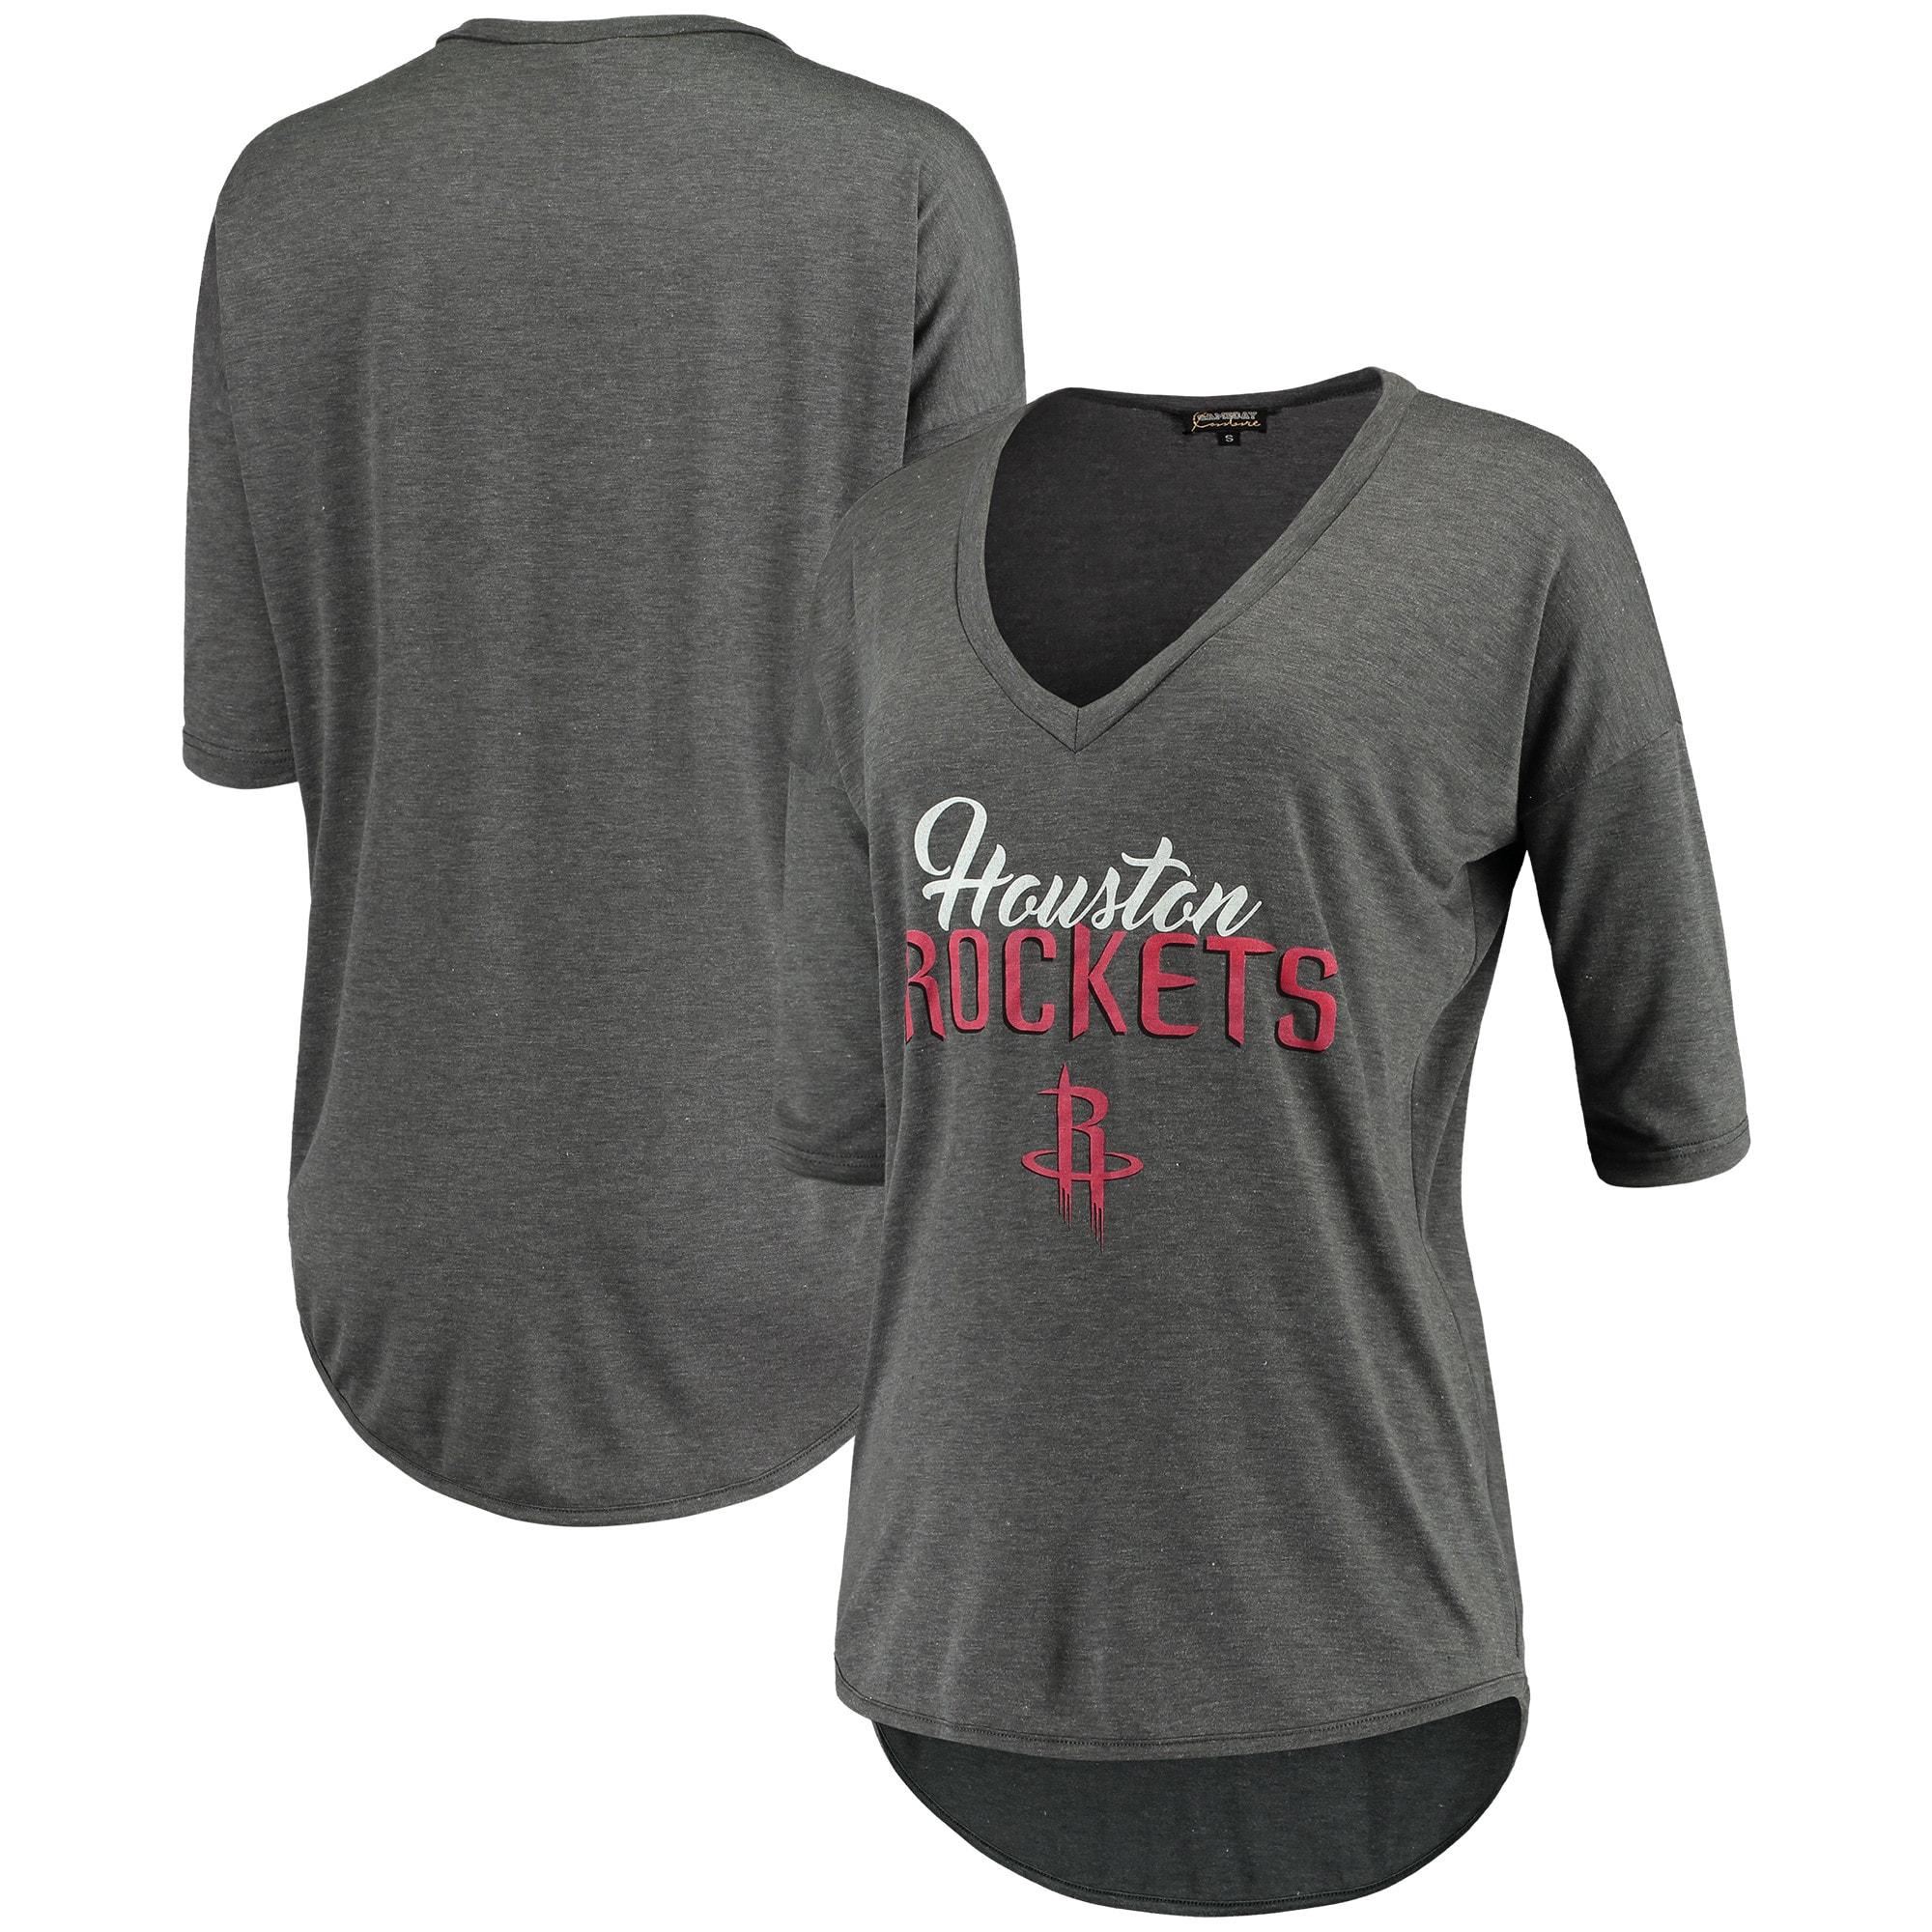 Houston Rockets Women's Deep V-Neck Tri-Blend Half-Sleeve T-Shirt - Gray